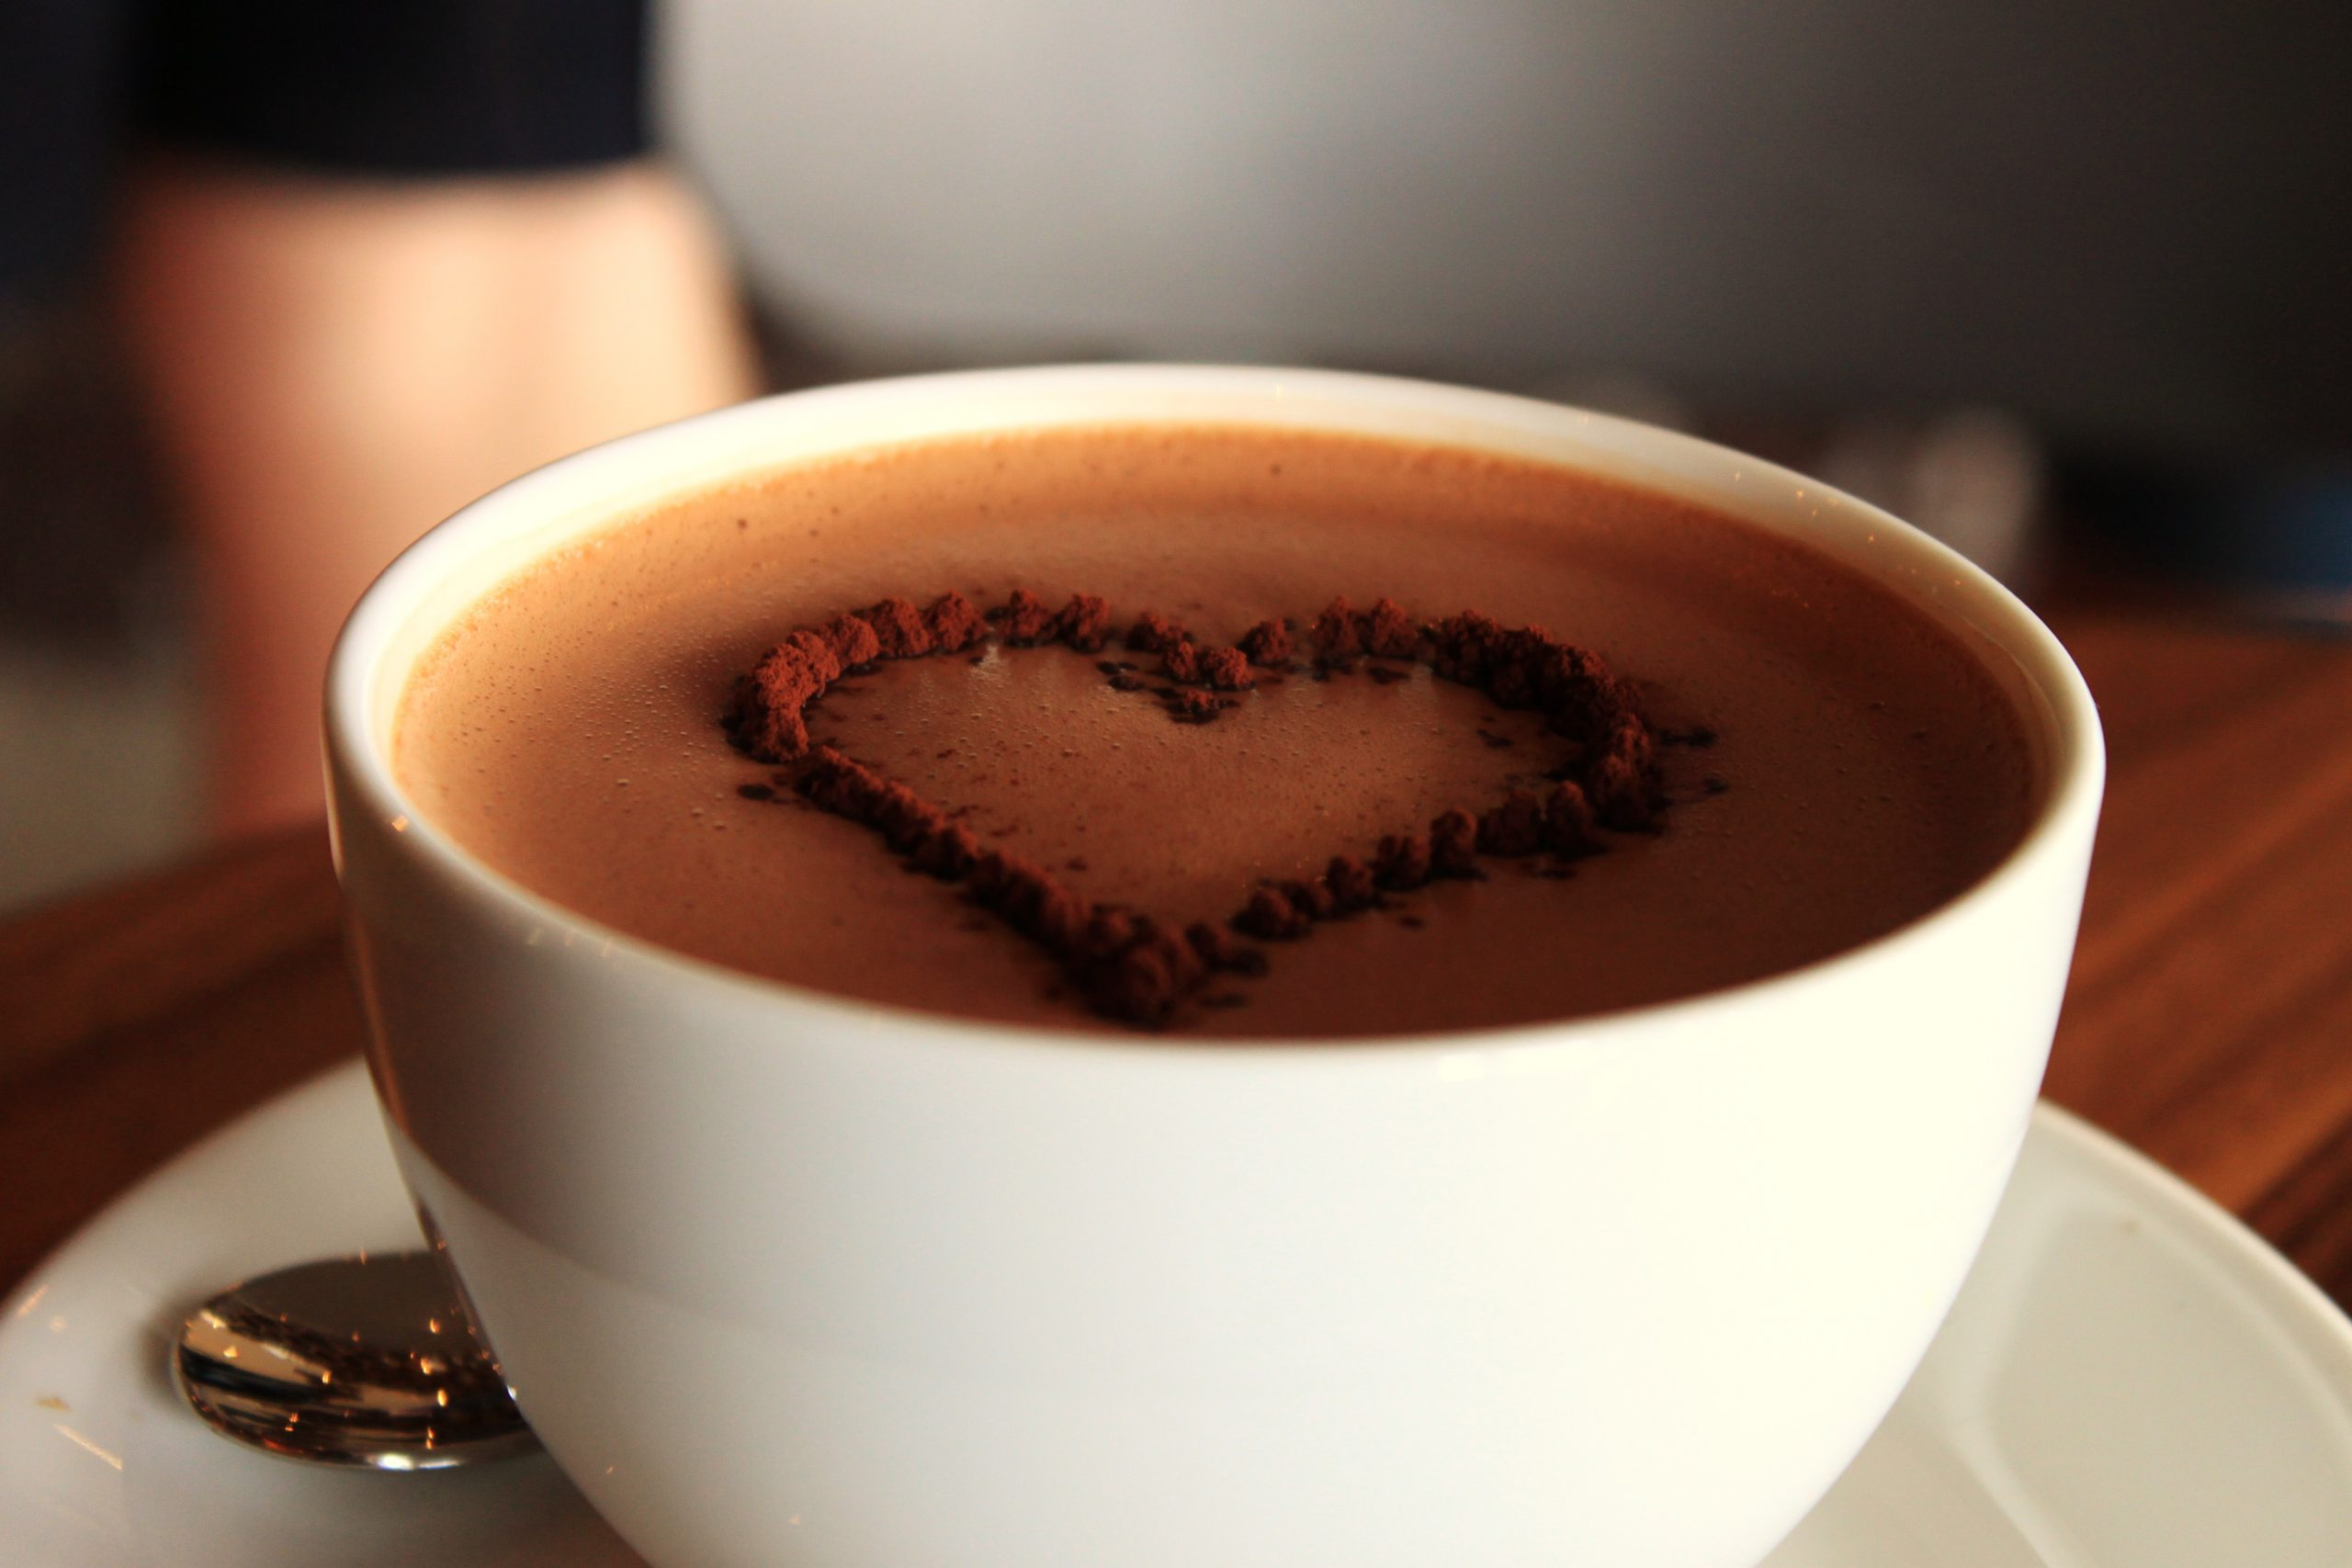 Spicy chocolademelk: for the looooove …